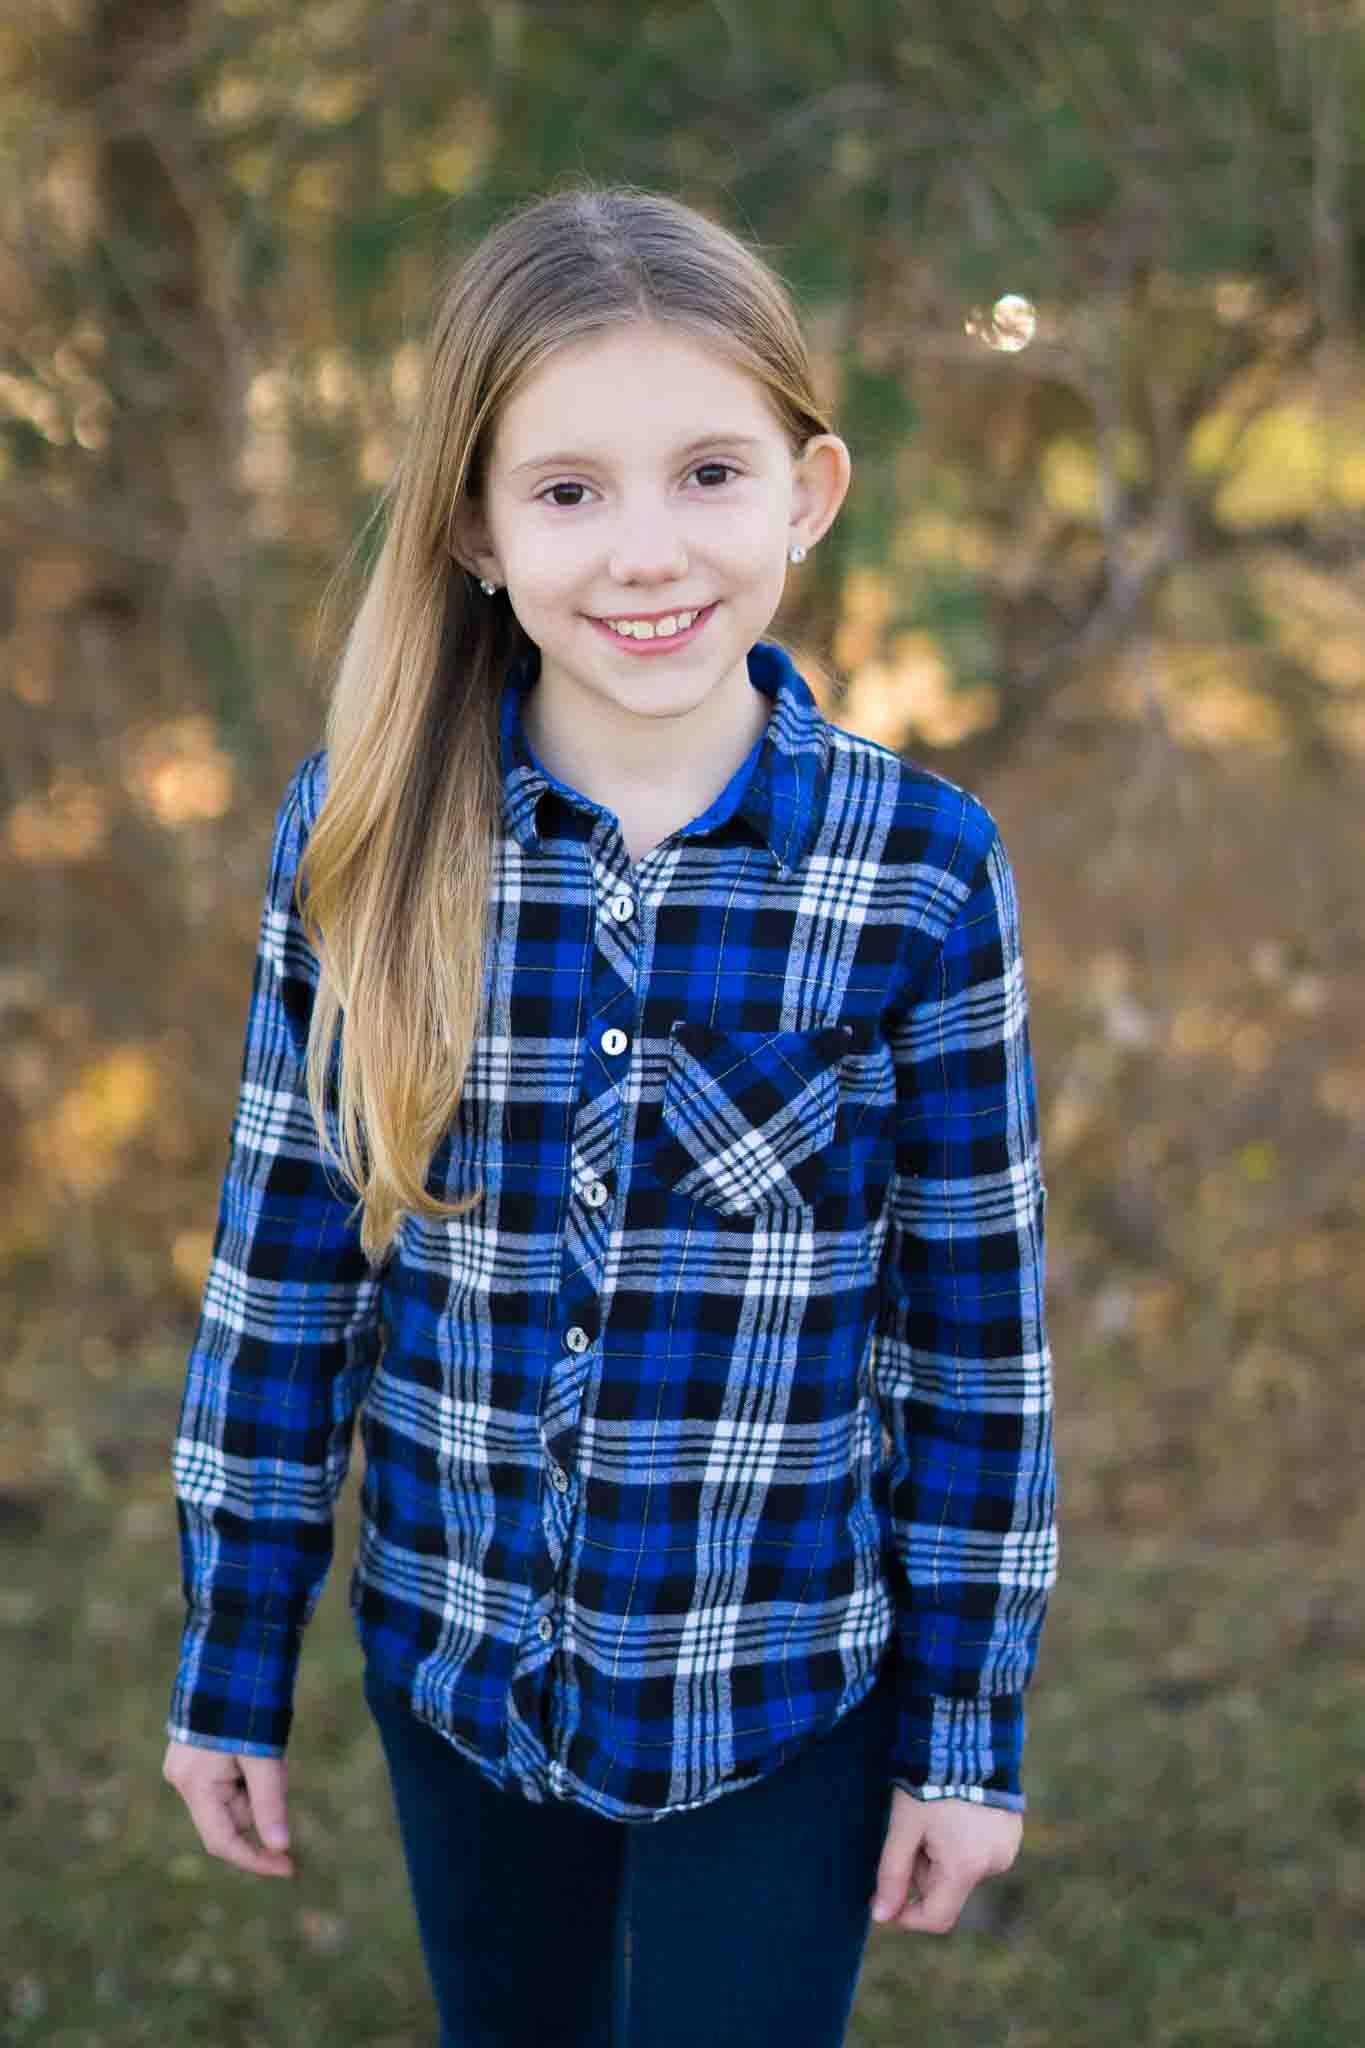 8 year old girl portrait portrait girl womens plaid